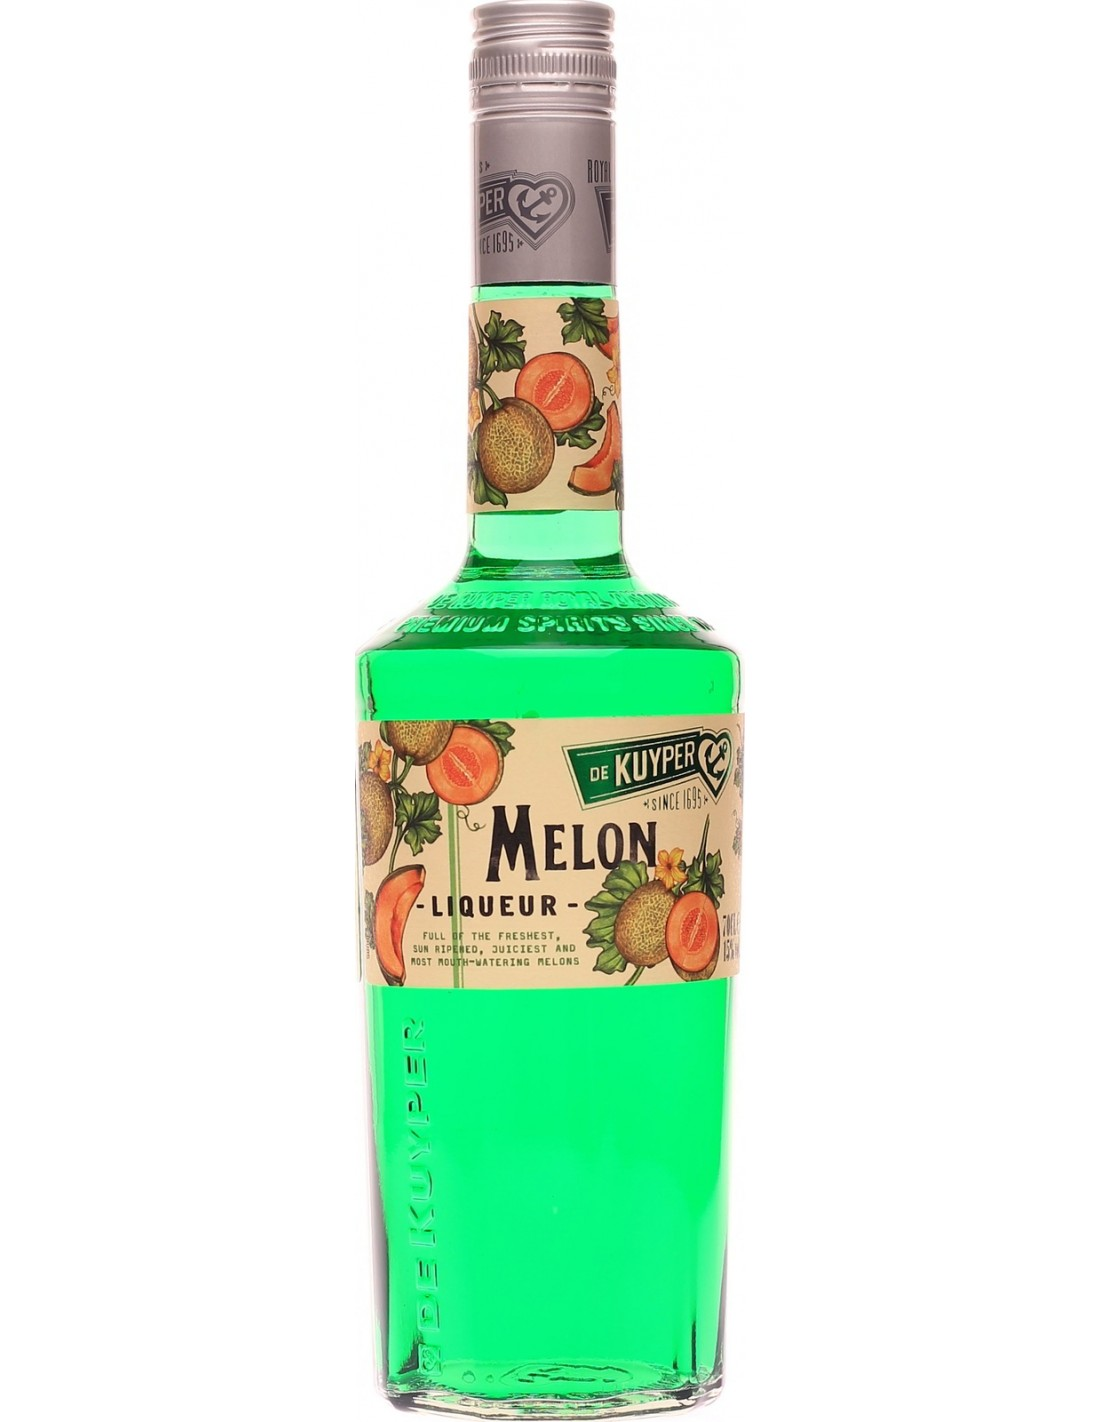 Lichior De Kuyper Melon, 24% alc., 0.7L, Olanda